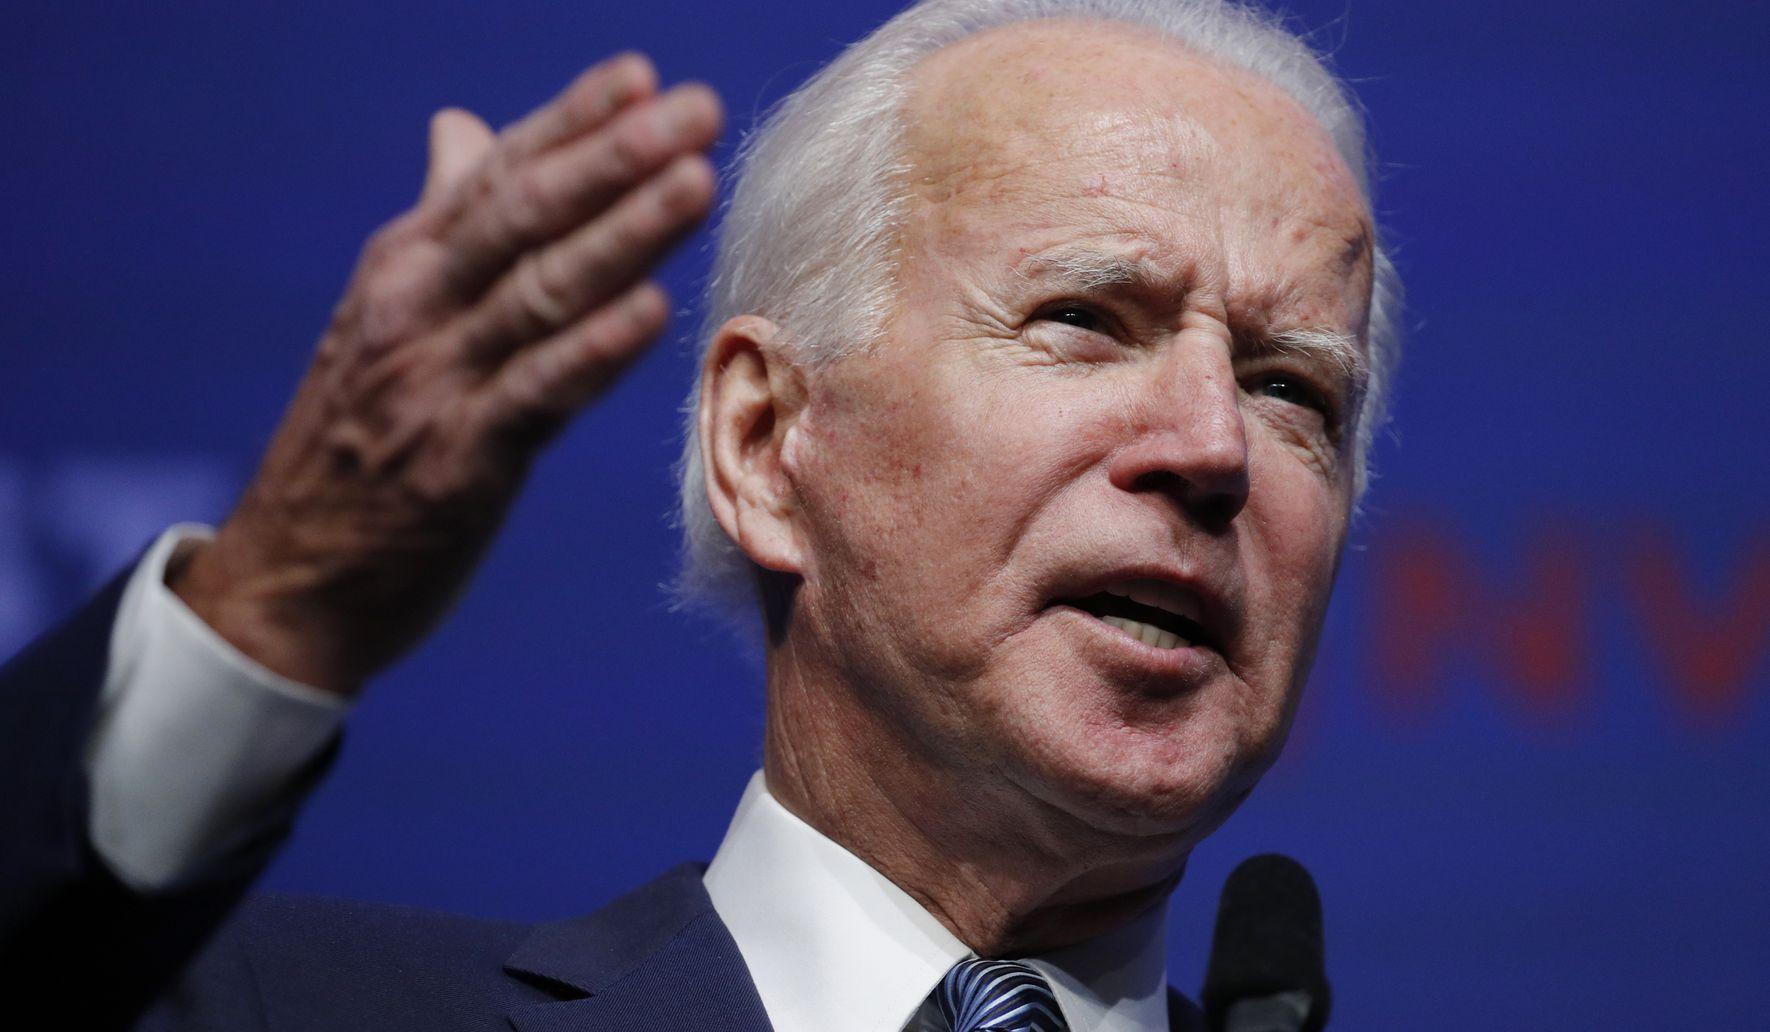 Joe Biden: Medicare-for-All doomed to fail